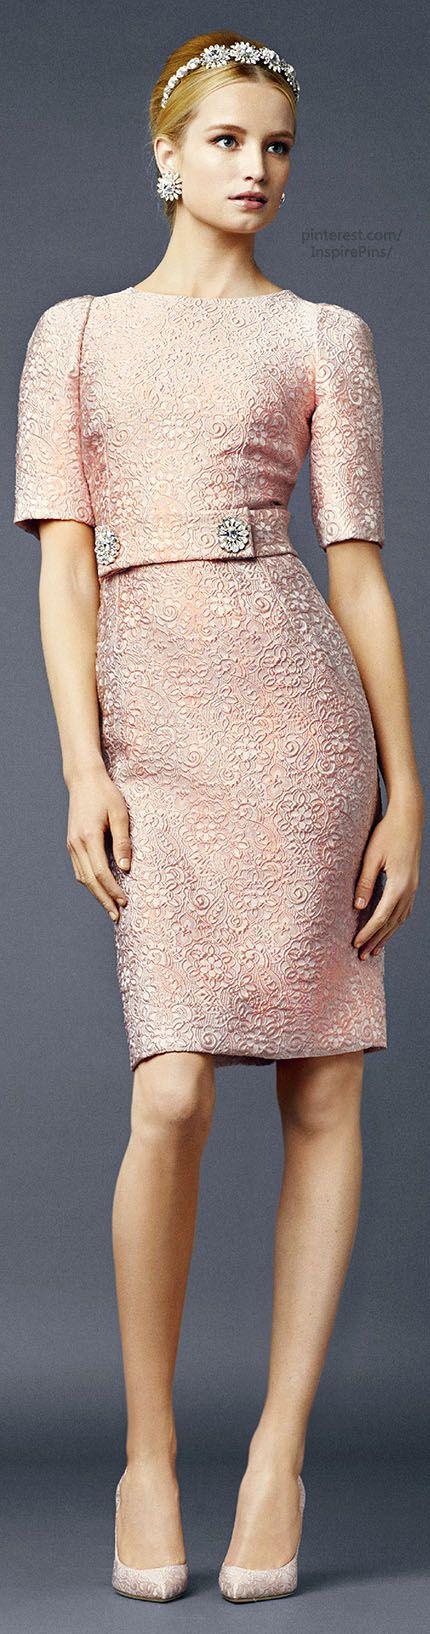 Dolce & Gabbana pink cocktail dress Beautifuls.com Members VIP Fashion Club 40-80% Off Luxury Fashion Brands